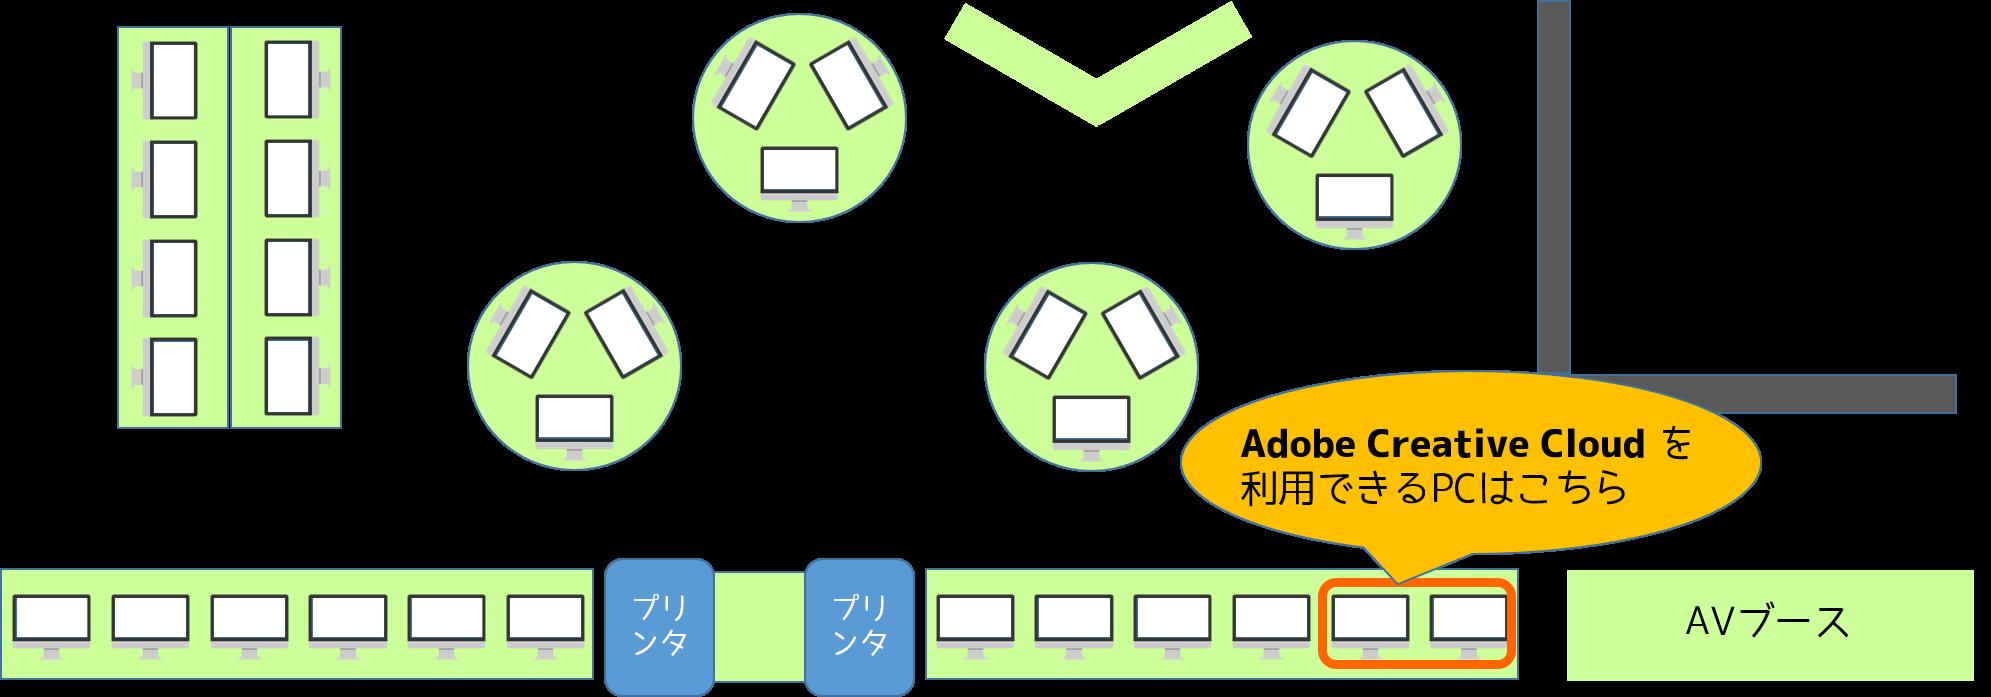 Adobe Creative Cloudを利用できる端末の場所